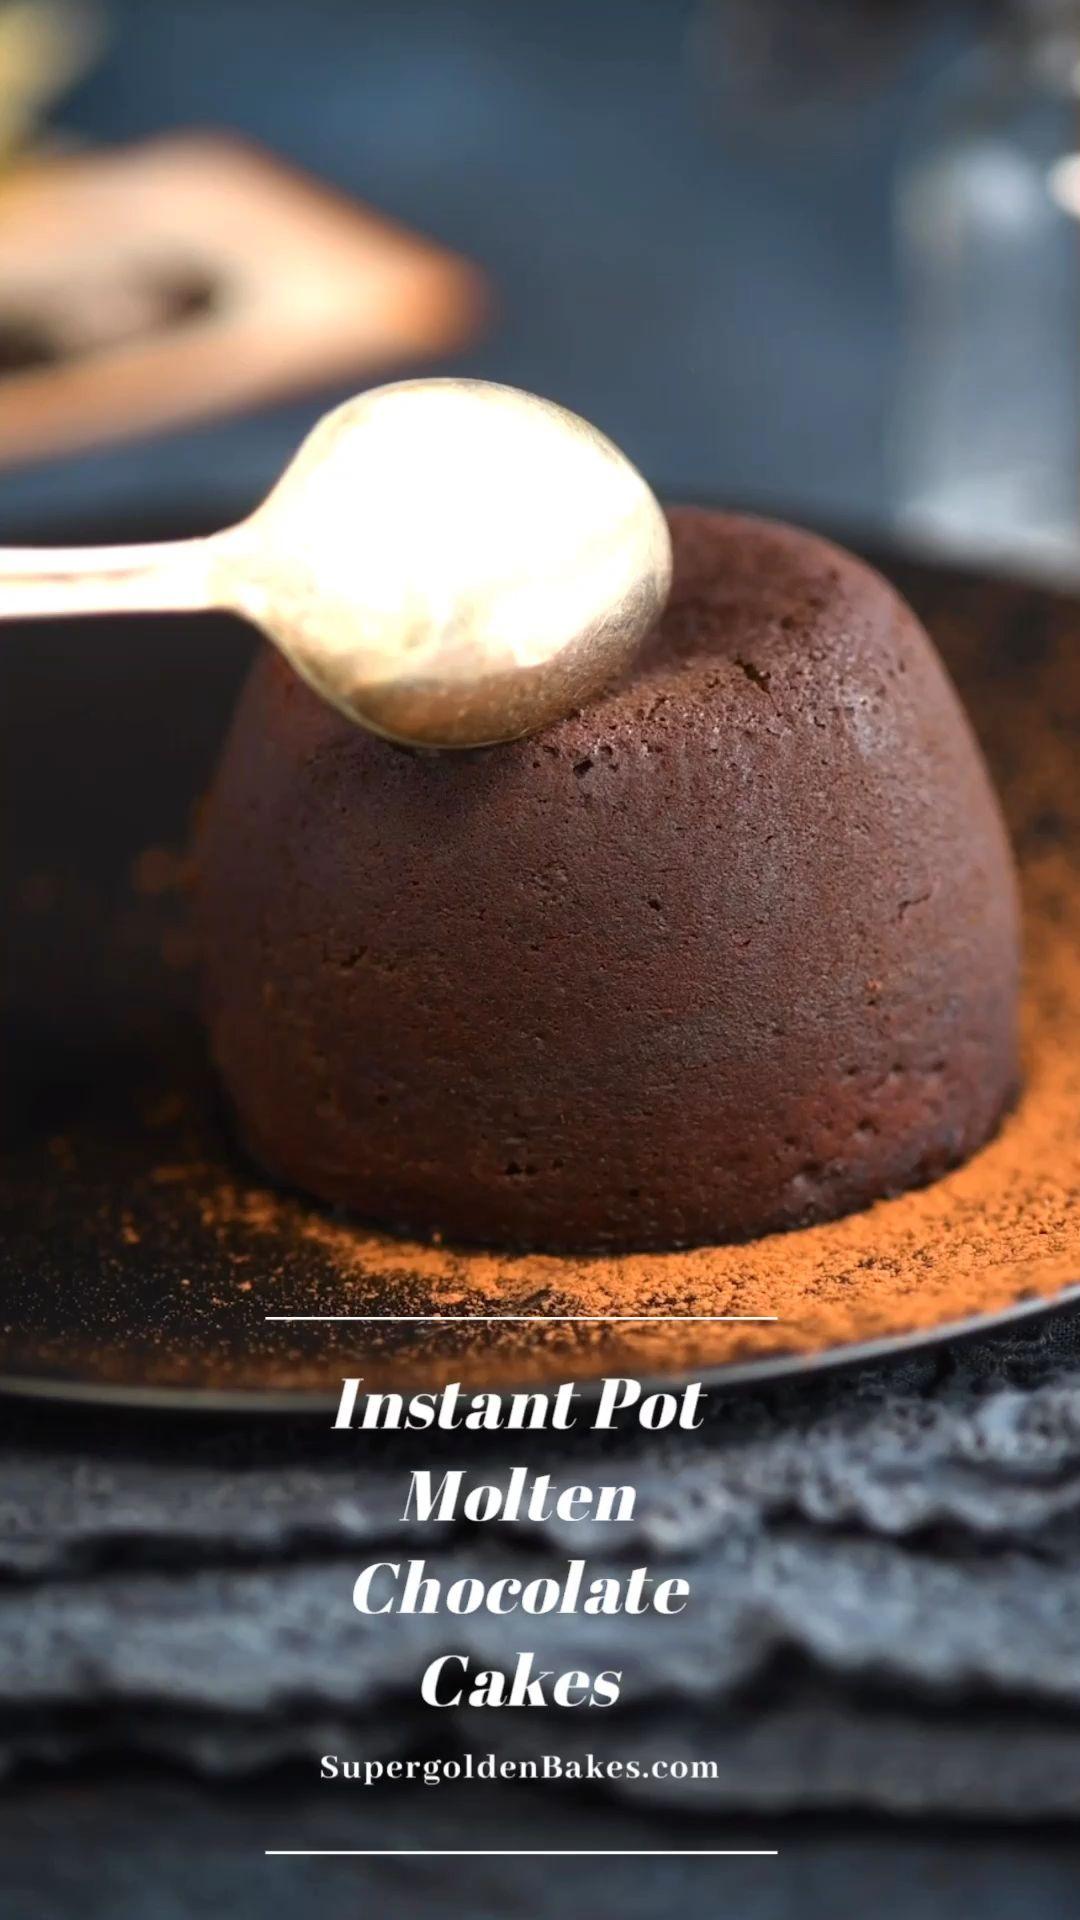 Instant Pot molten chocolate cakes - Supergolden B